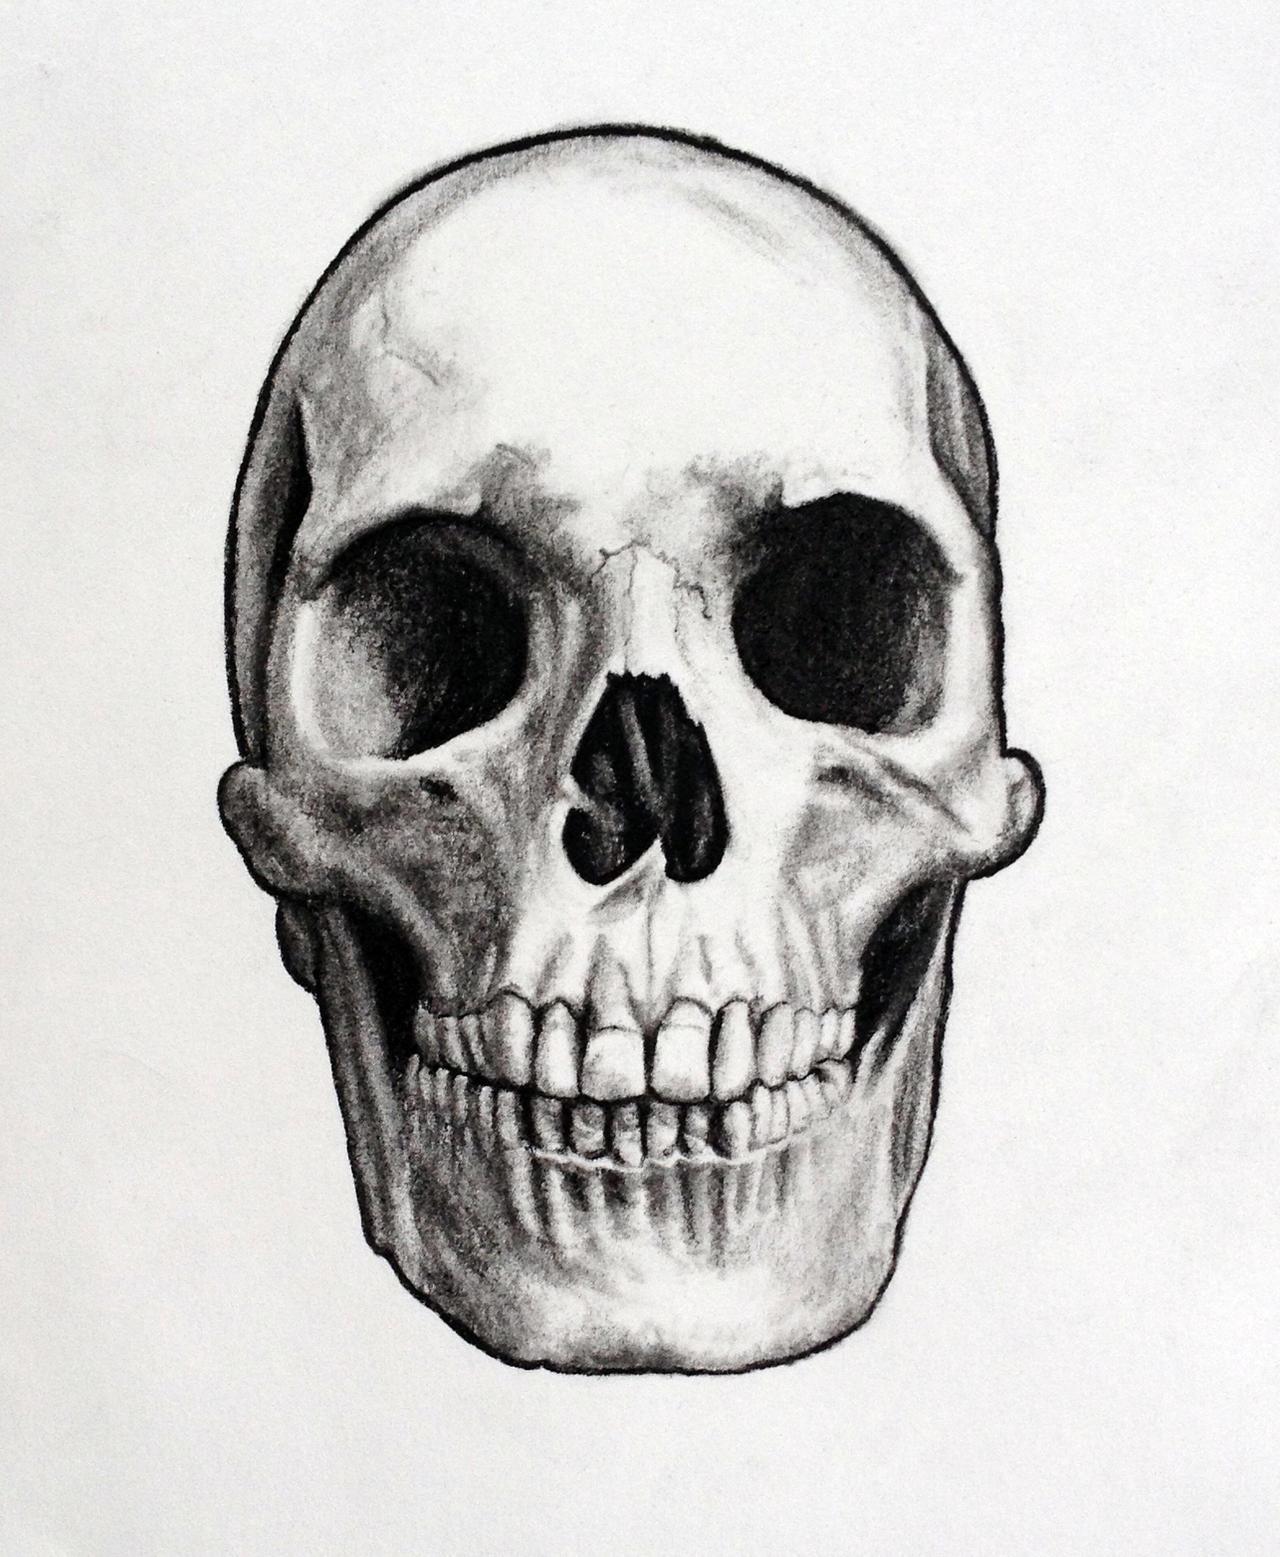 Charcoal Skull Drawing by John Gordon by JohnGordonArt on